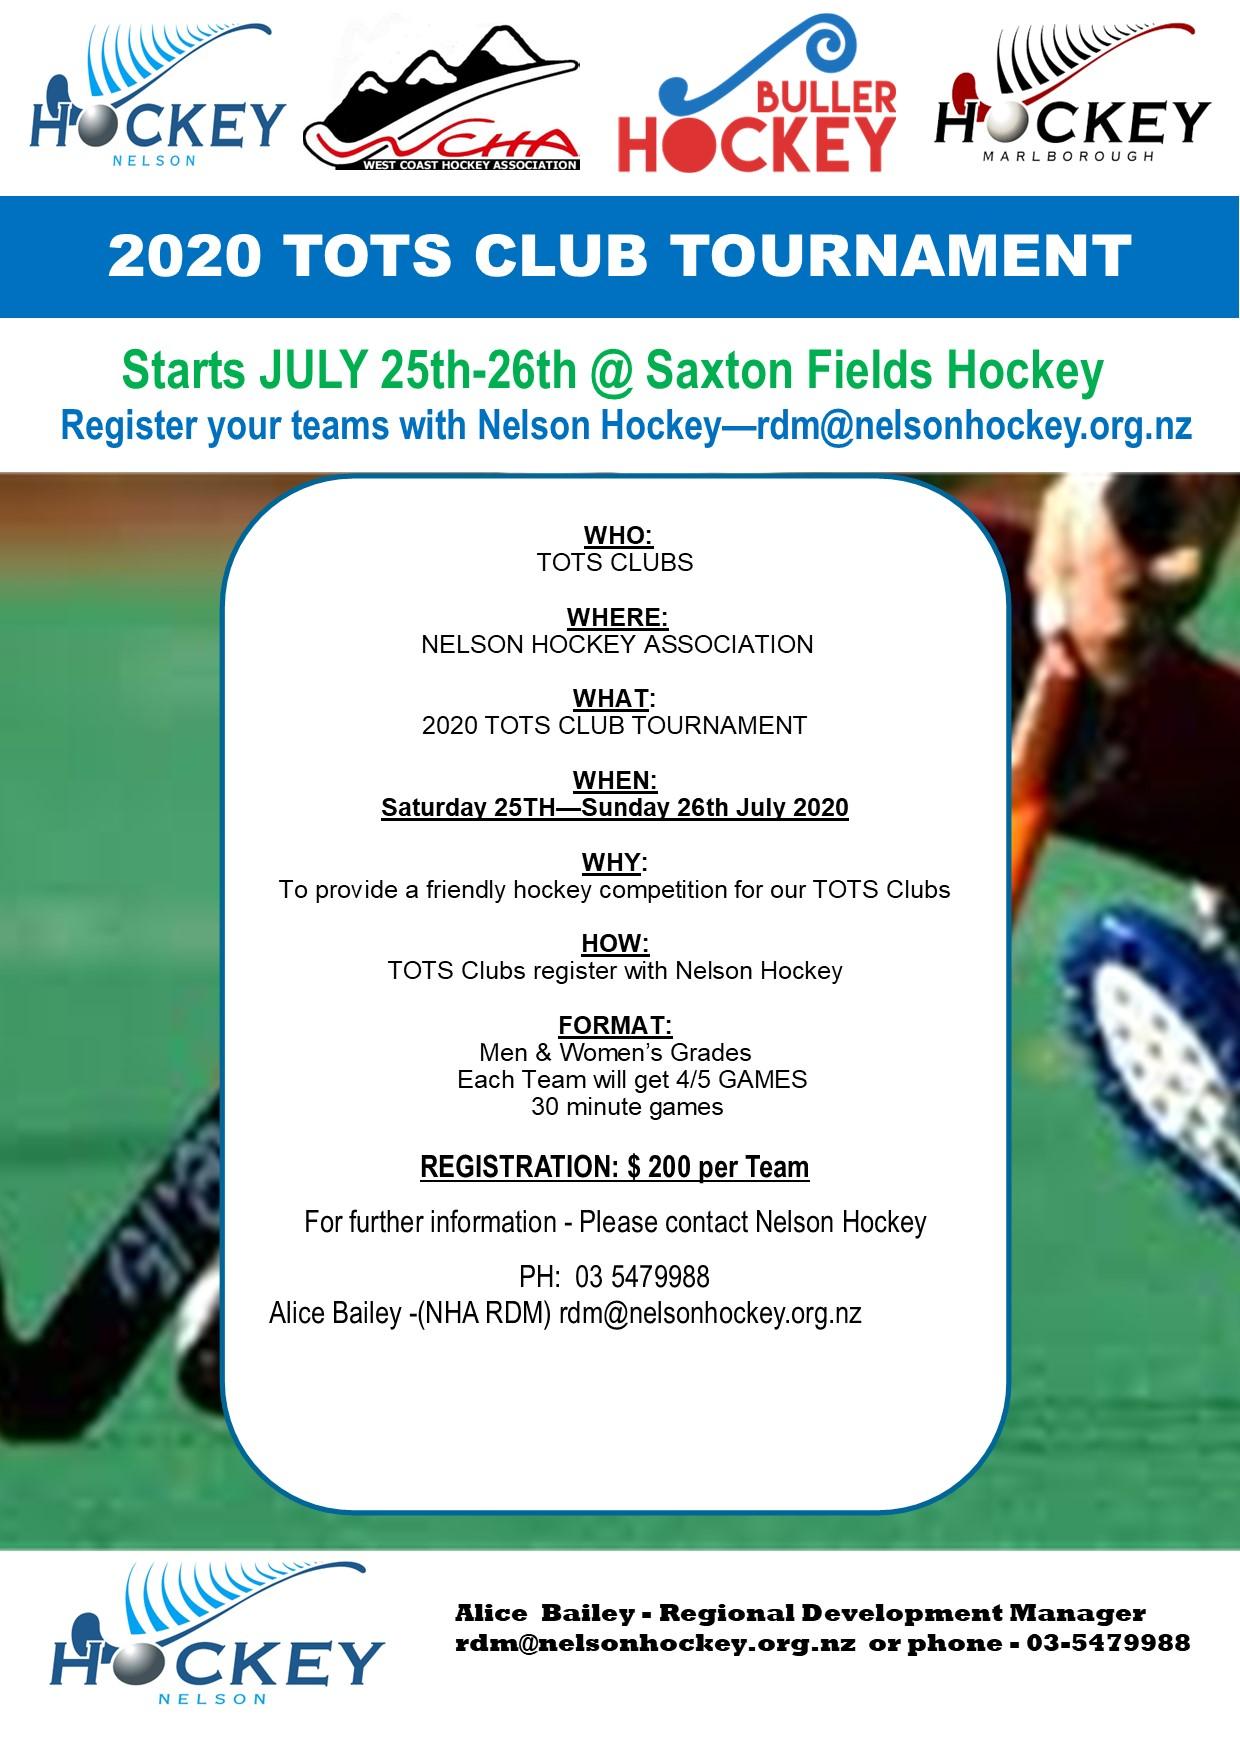 2020 TOTS CLUB HOCKEY TOURNAMENT-JULY 25th & 26th-Registrations Open!!!